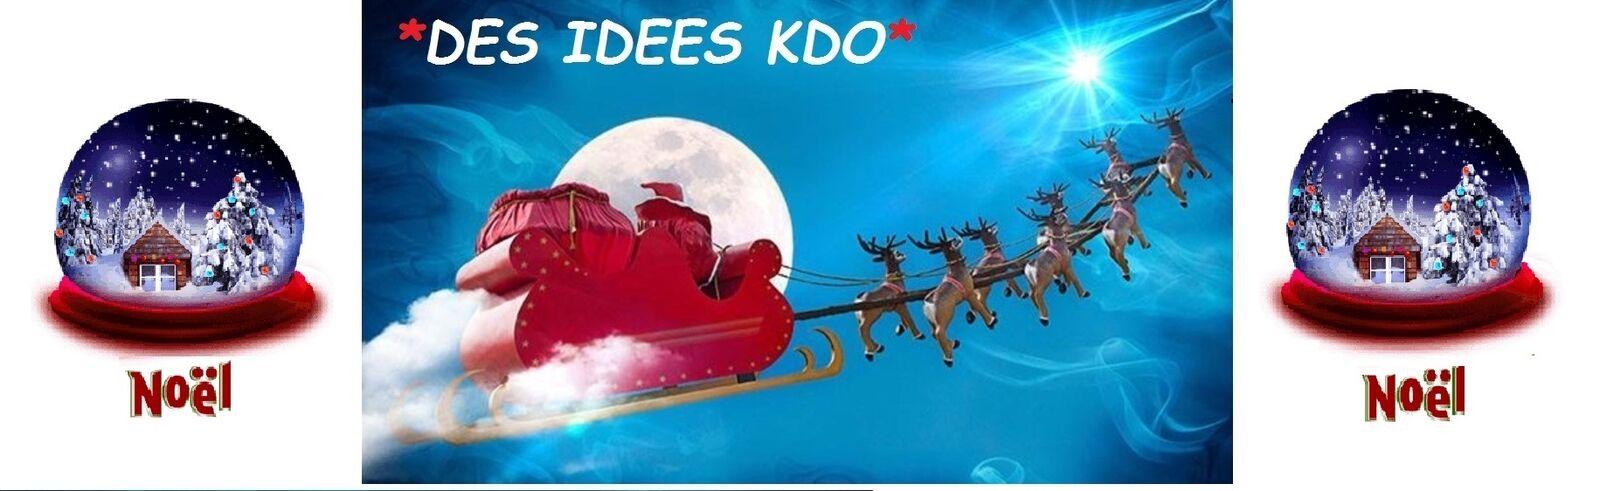 DES IDEES KDO